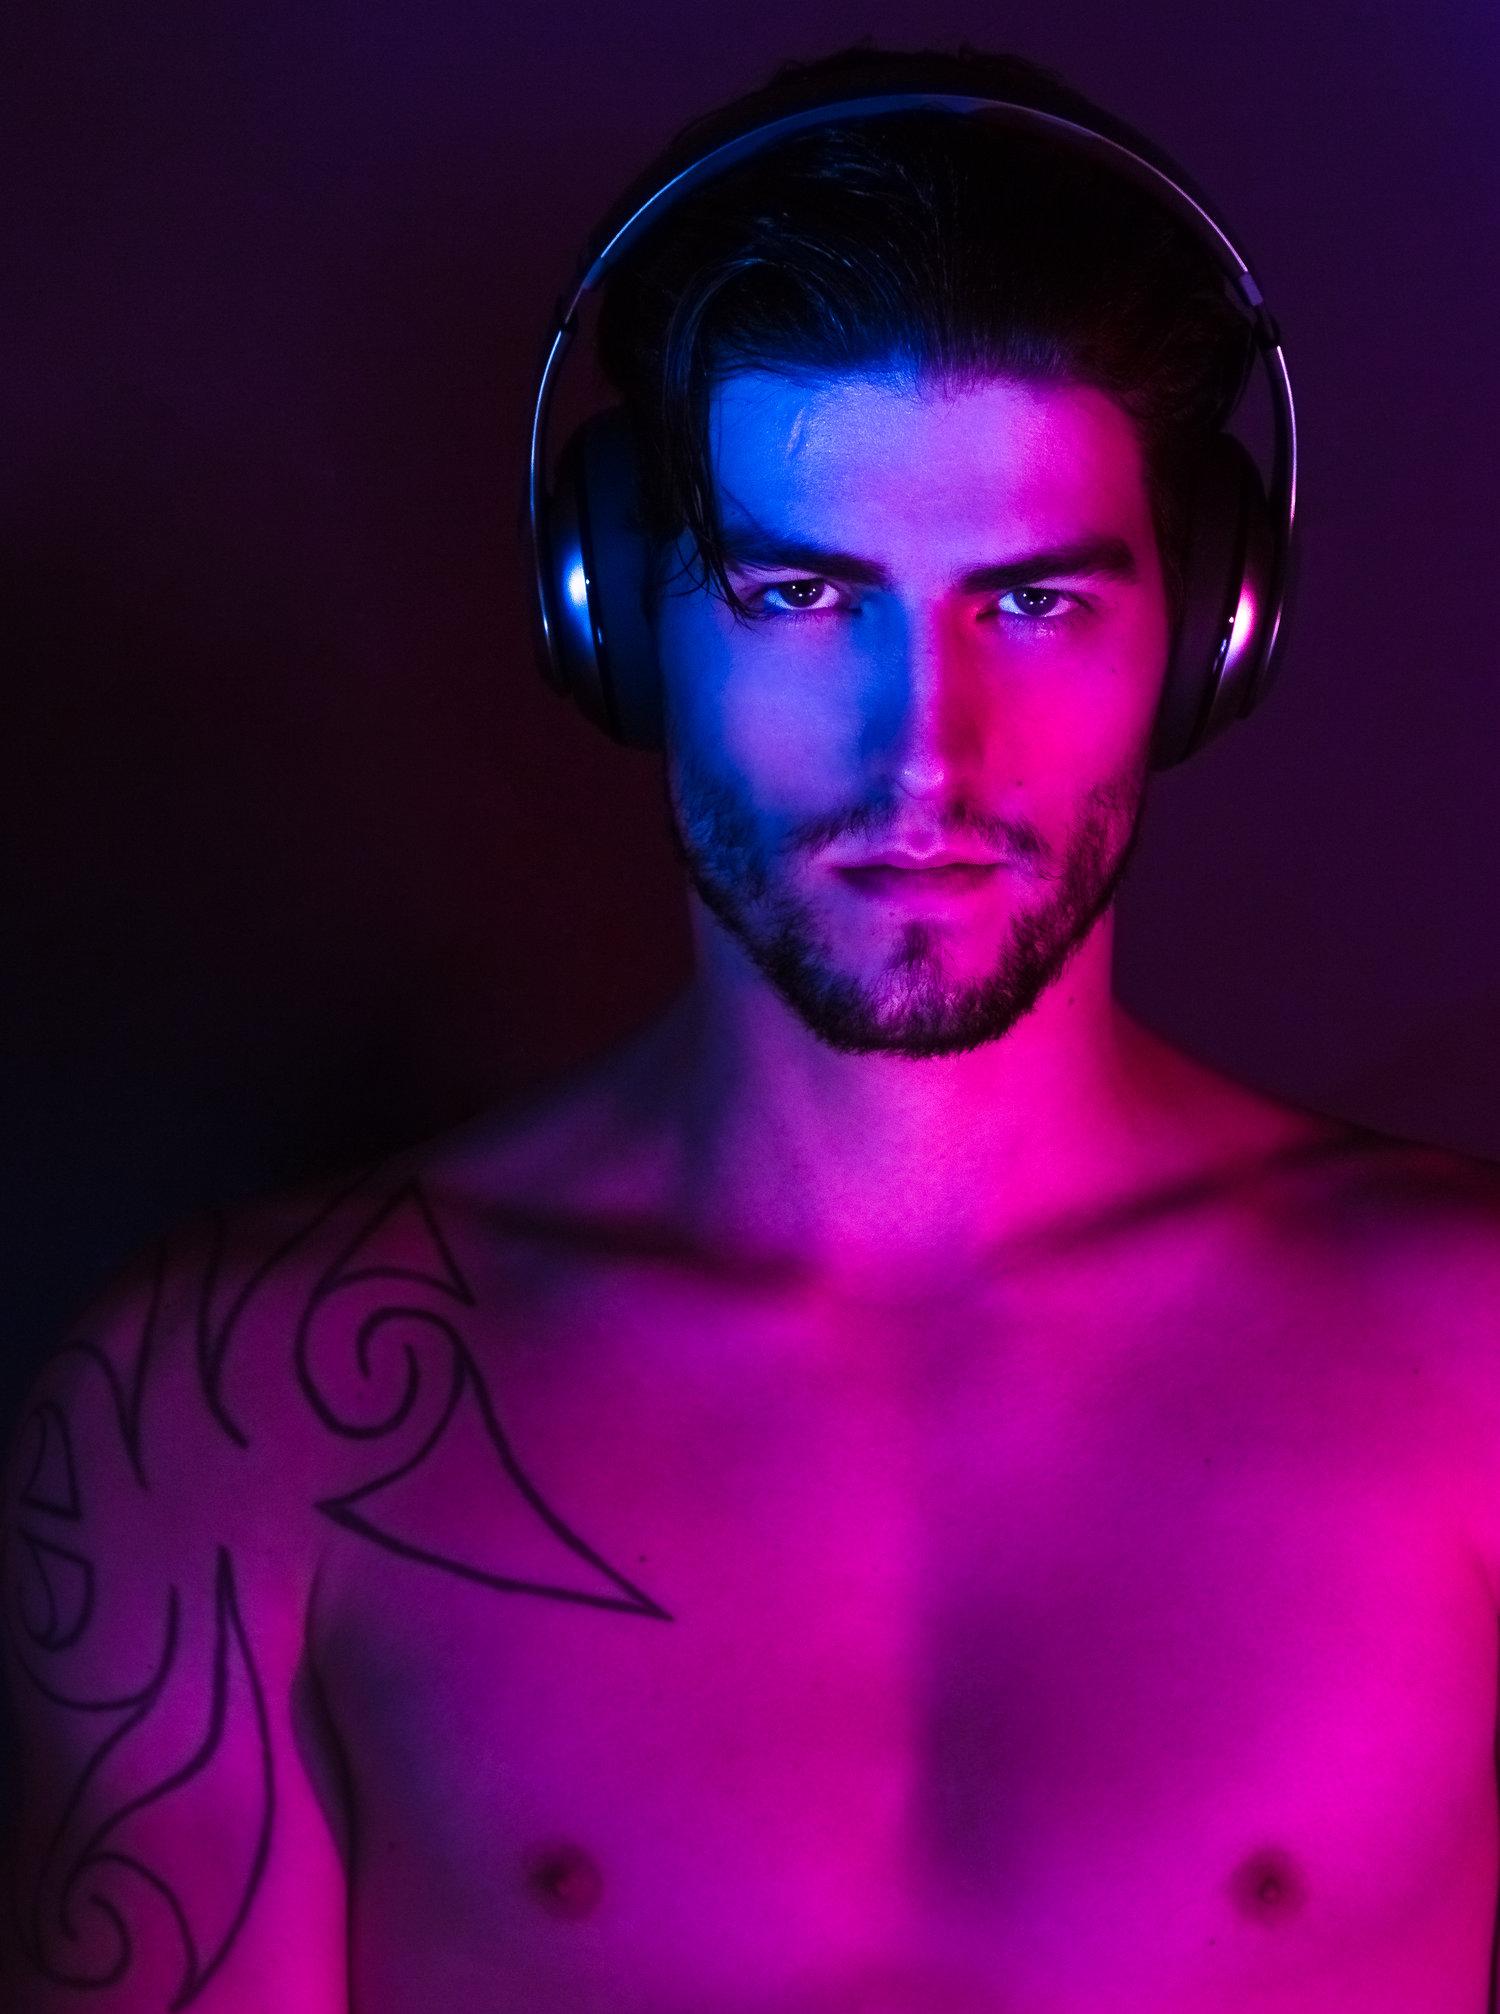 Adon Exclusive: Model Ben Furney By Alex Tupaz